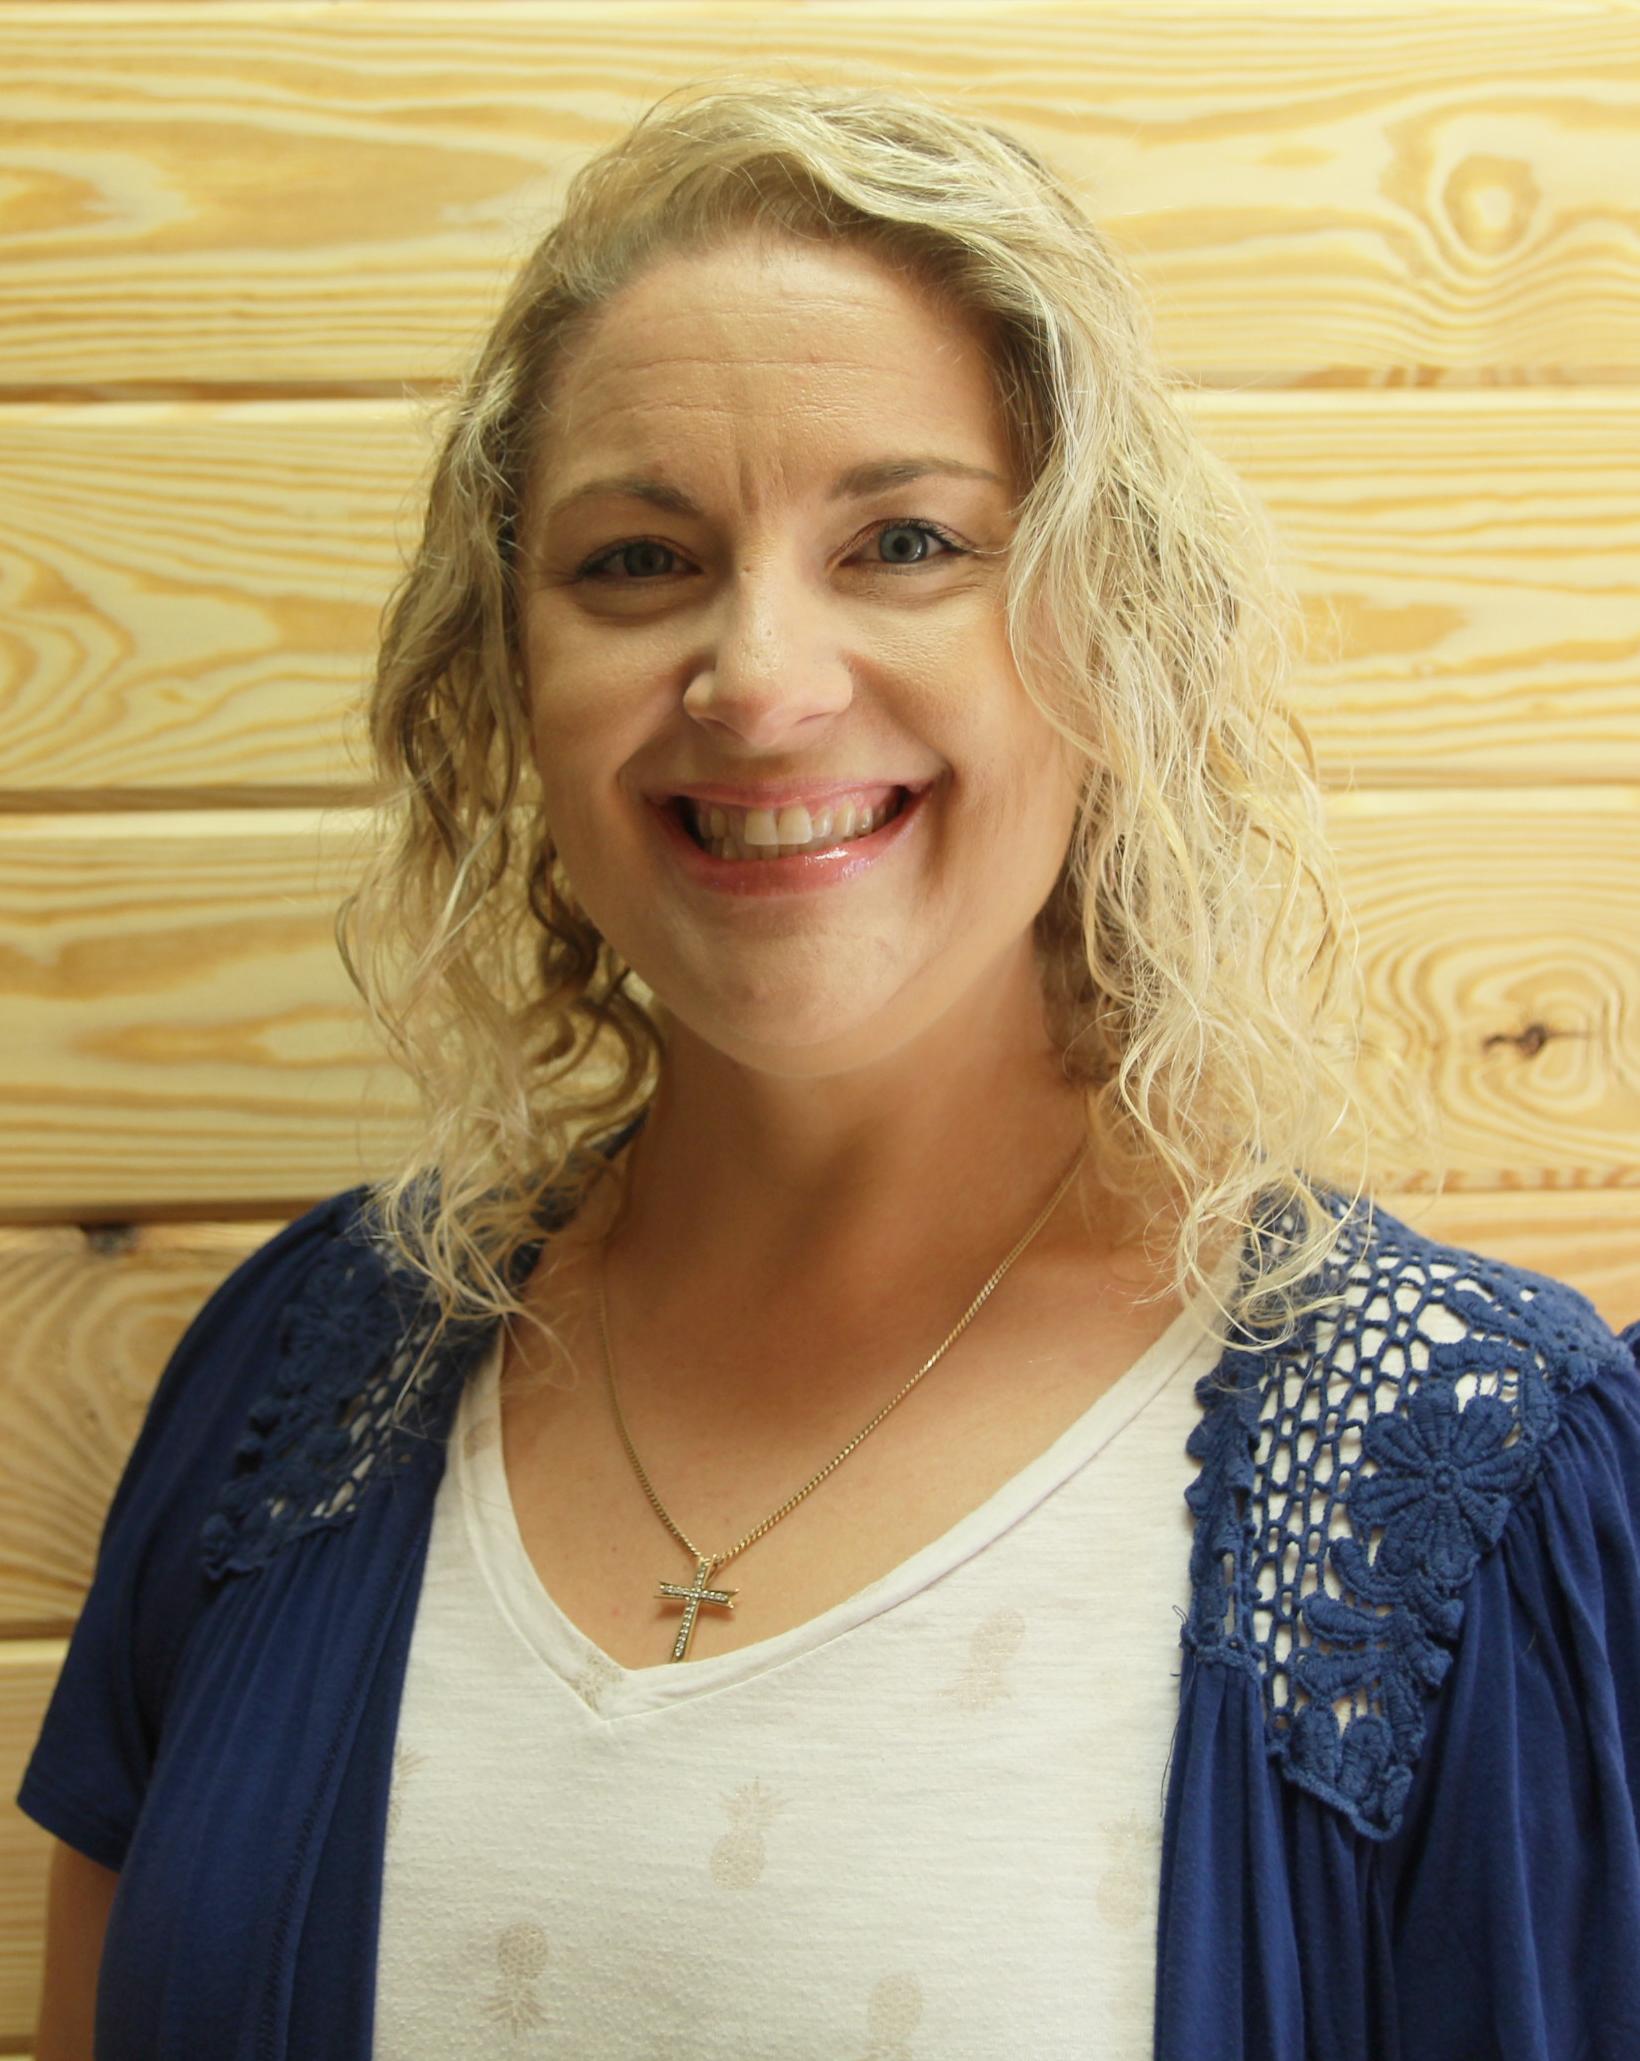 Amanda Roussel